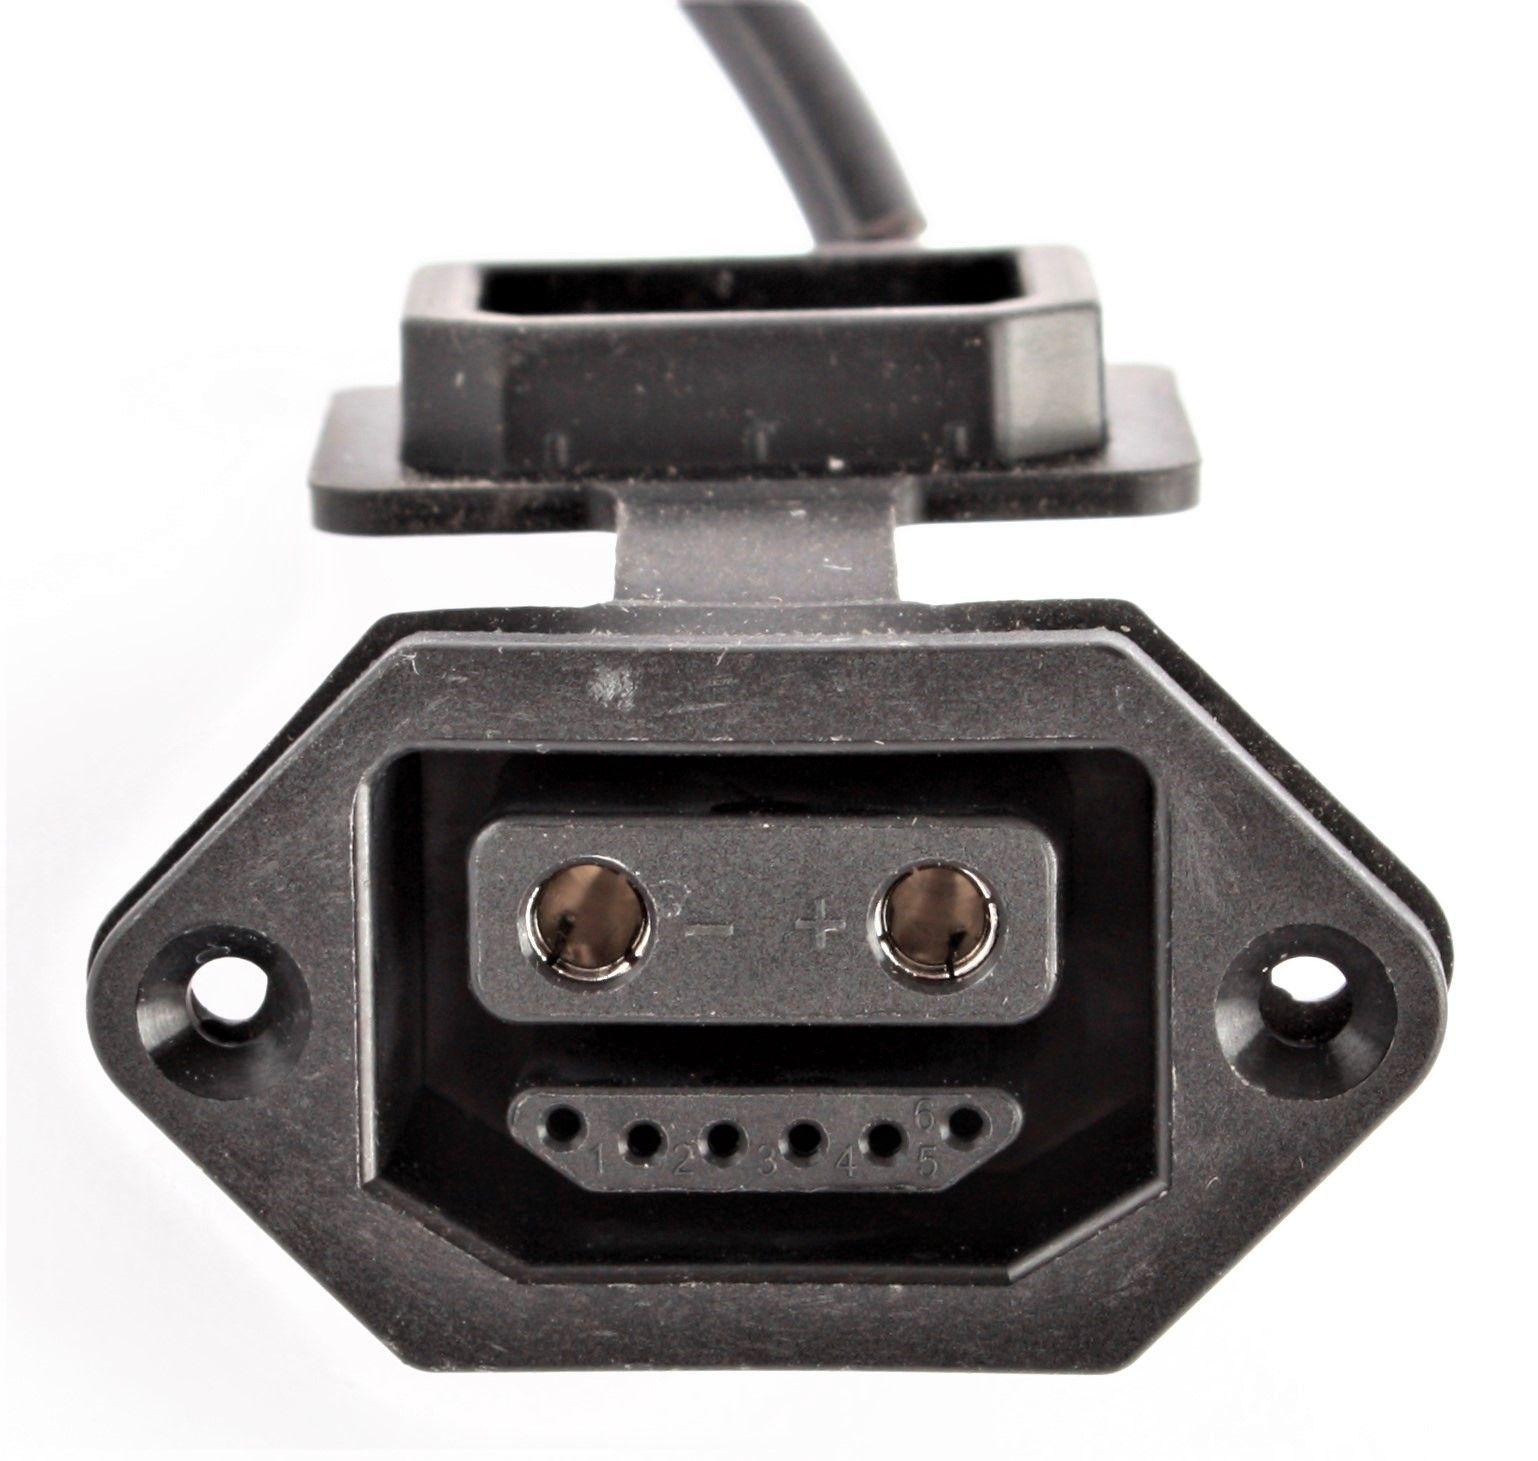 redukce-baterie-elektrokolobezka